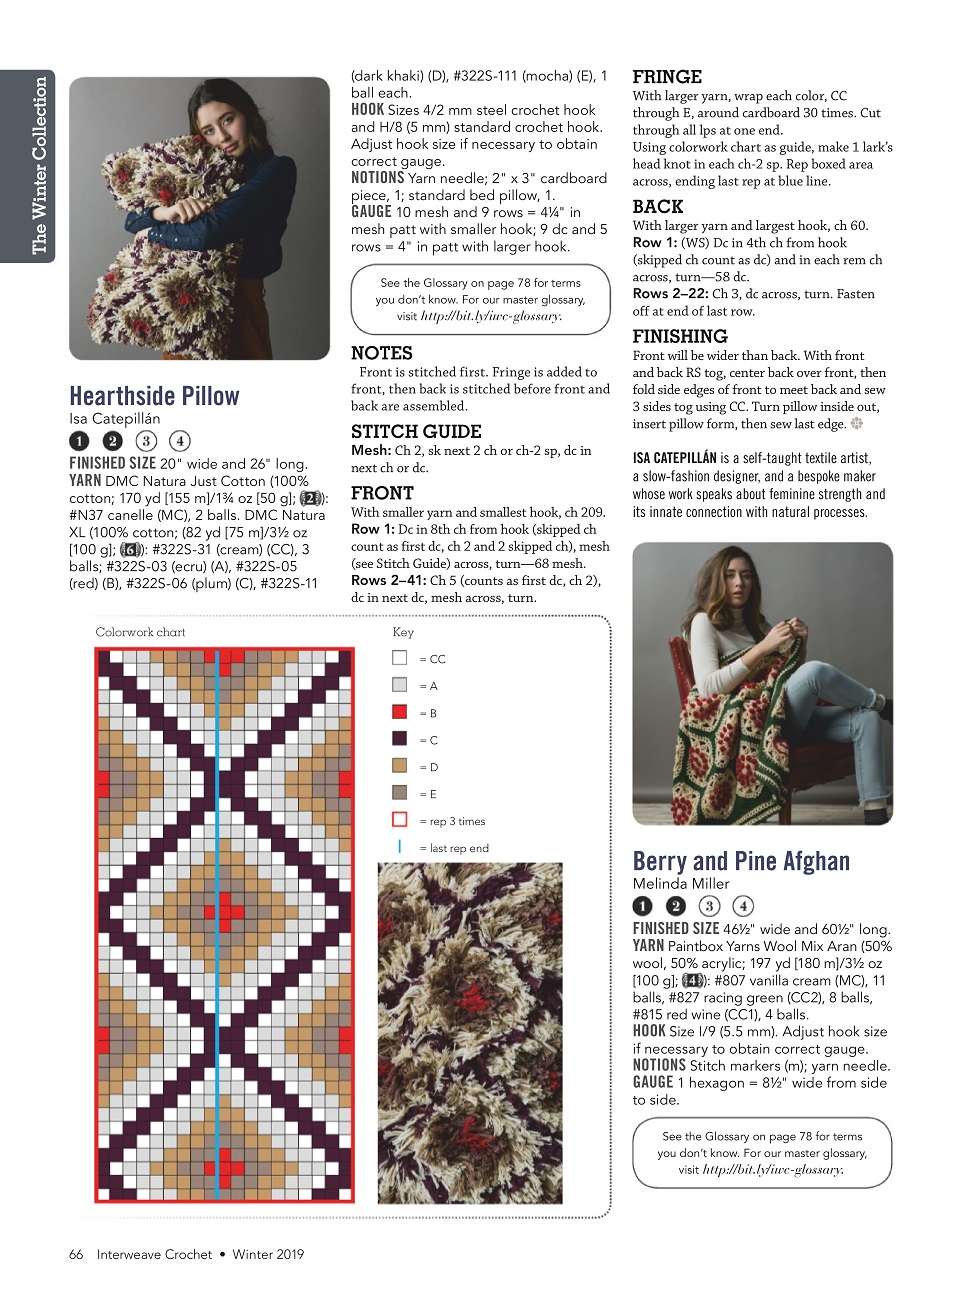 Interweave Crochet Winter 2019-67